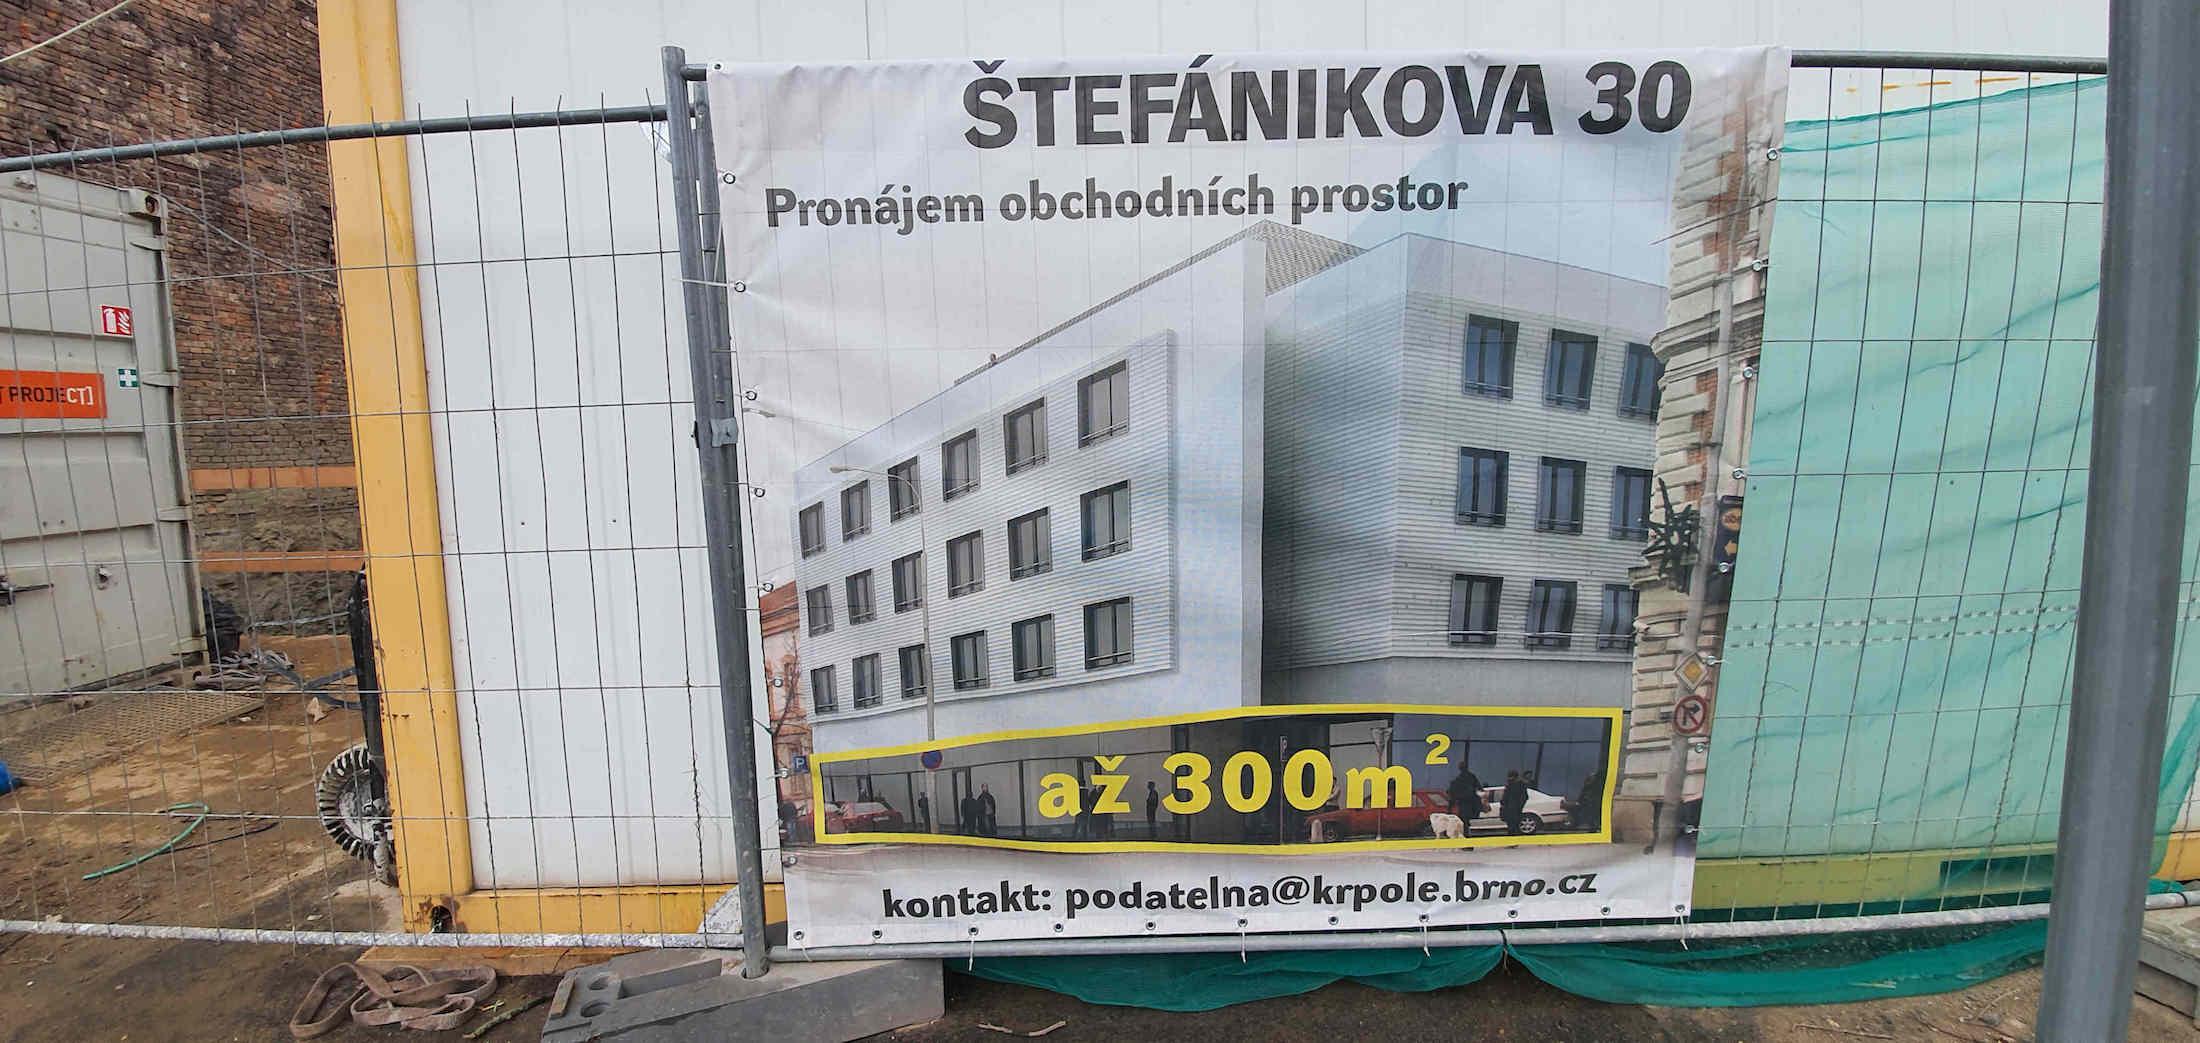 Polyfunkční dům na rohu ulic Rybníček a Štefánikova